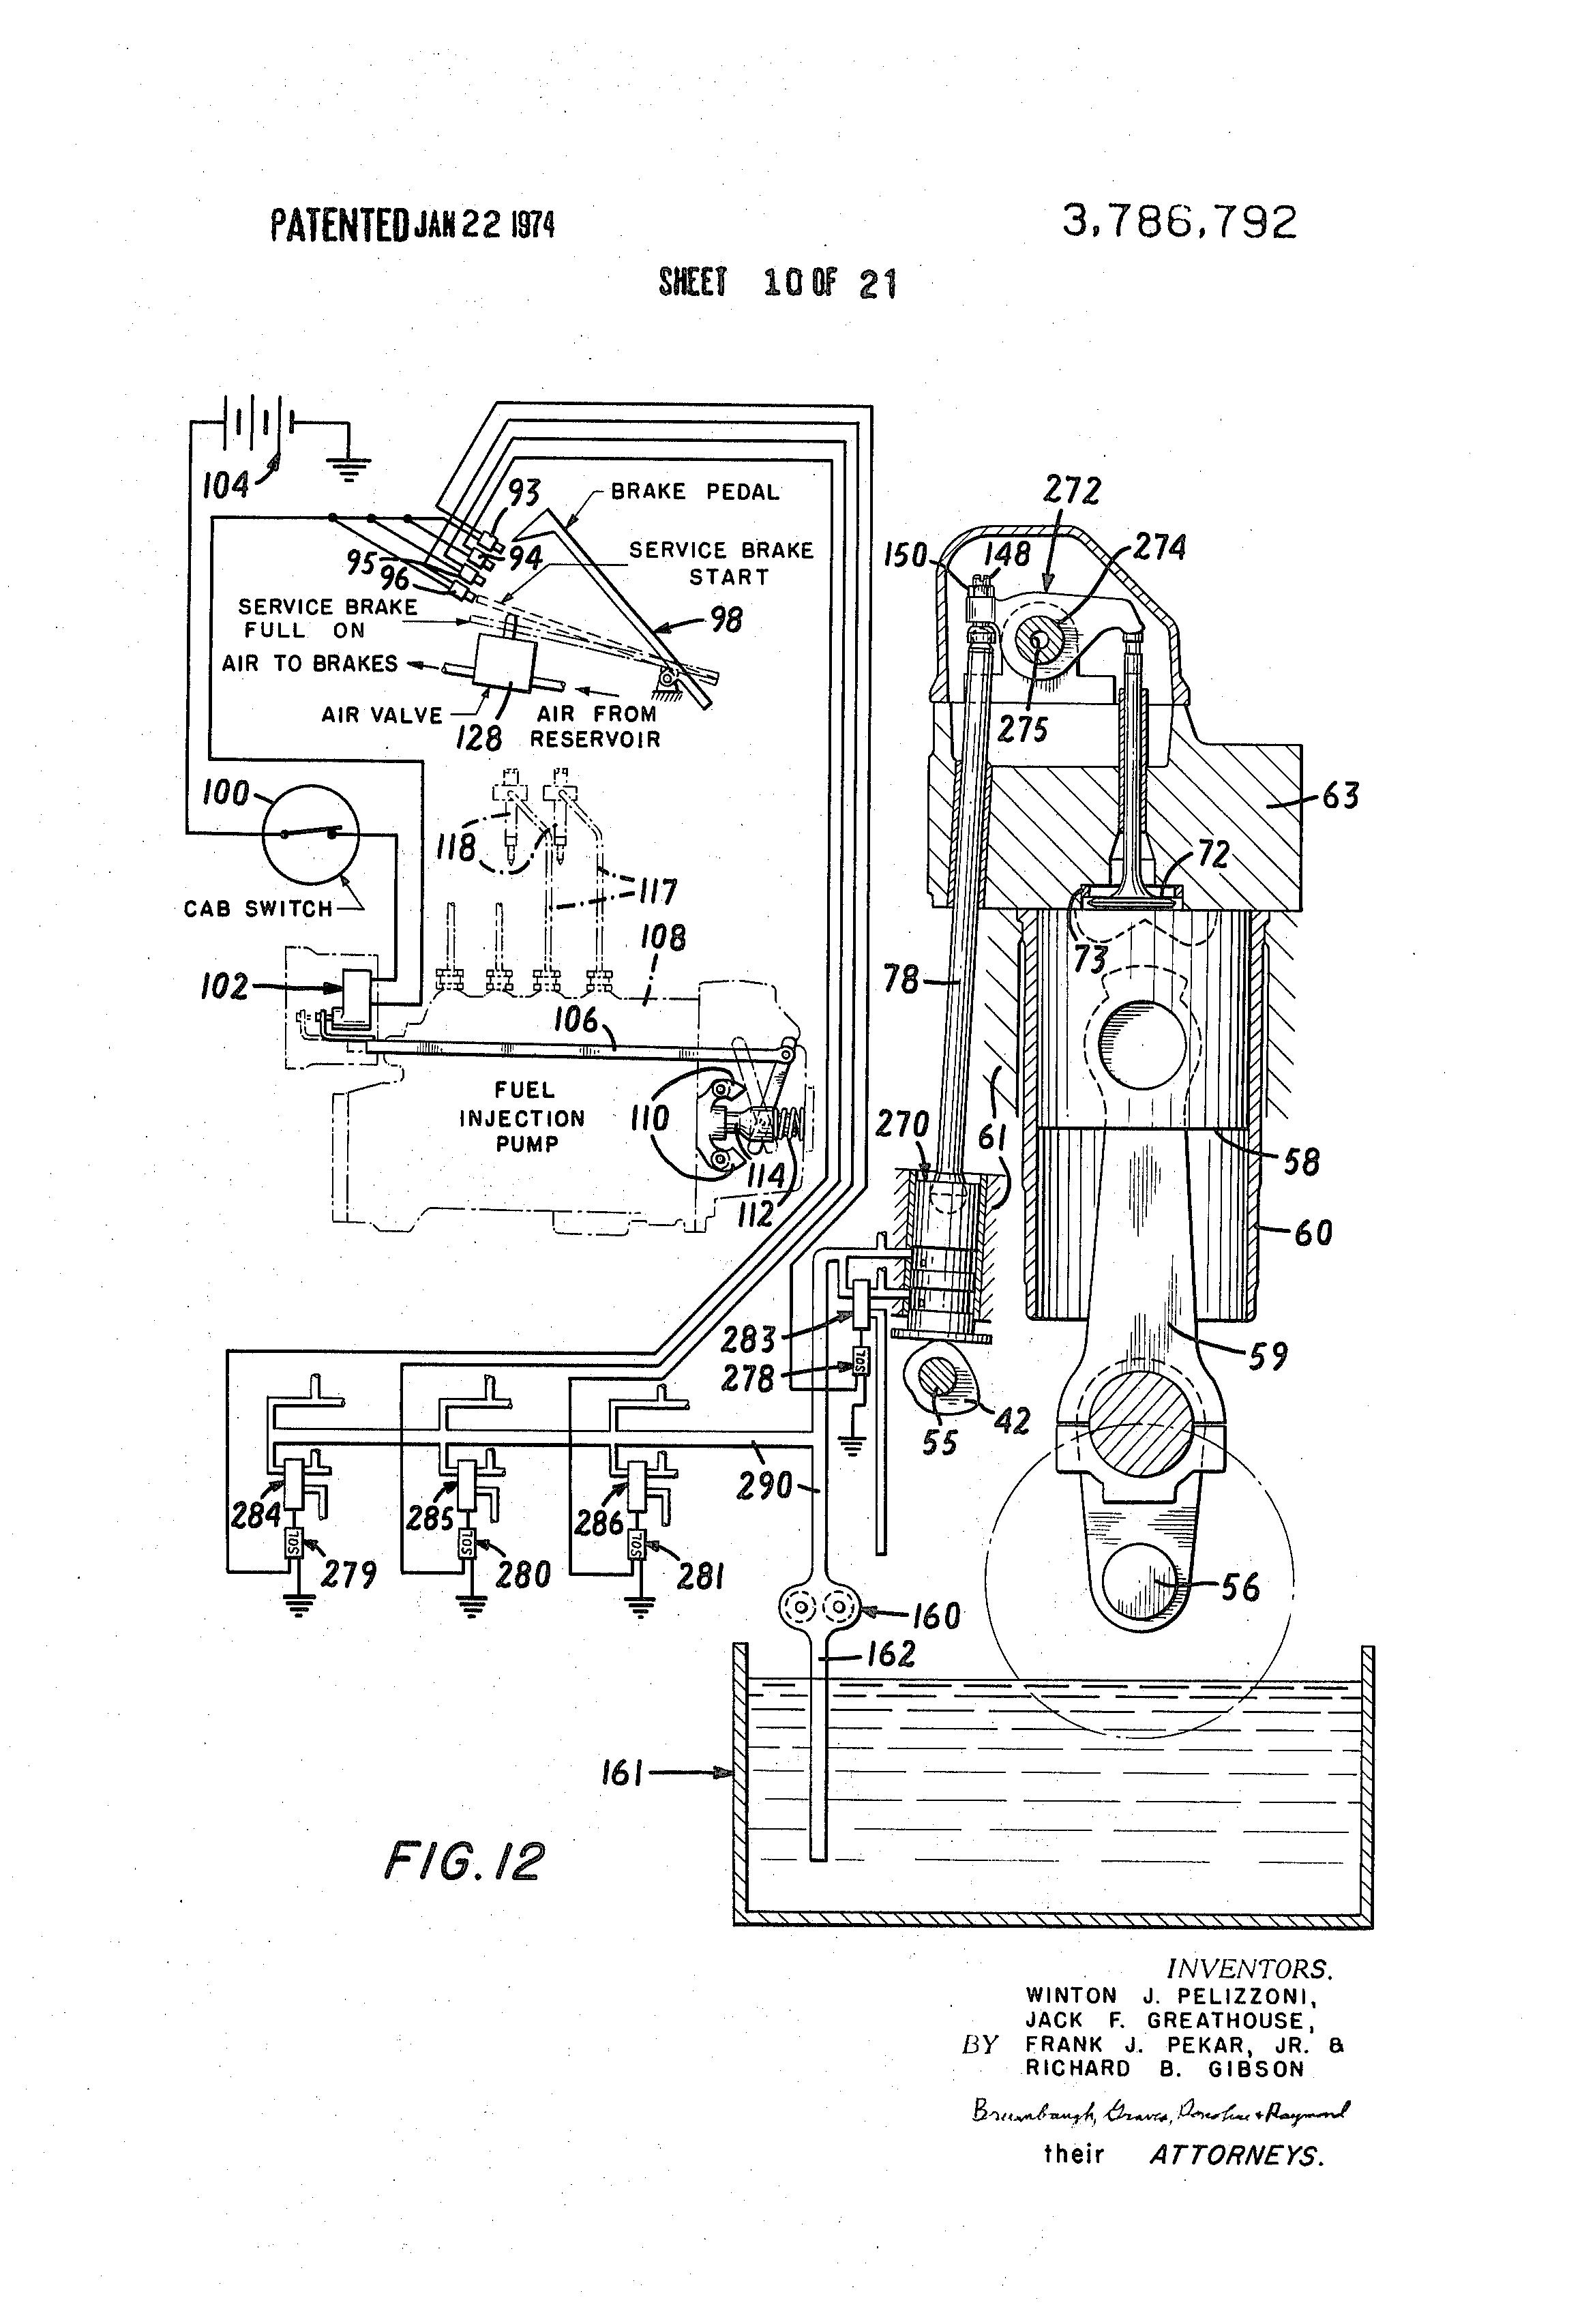 Wiring Diagram For 18 Hp Briggs Stratton Engine